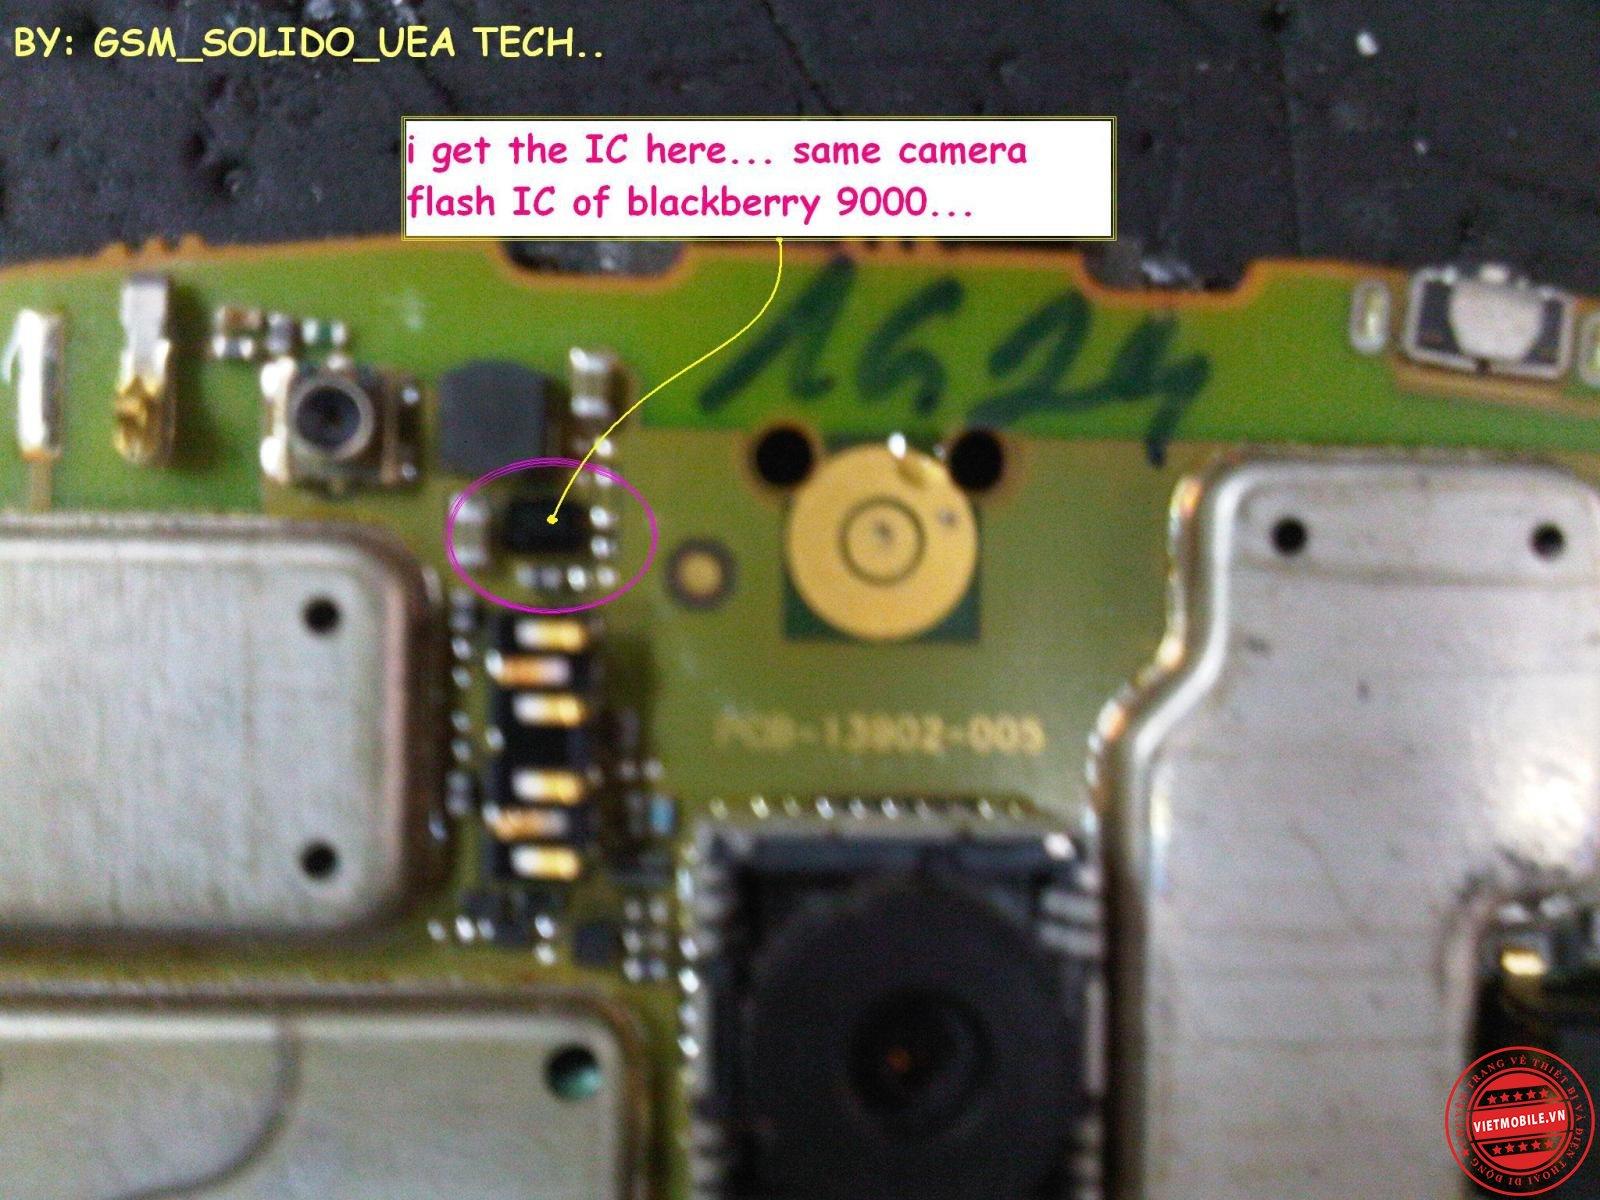 9700 camera flash light 2.